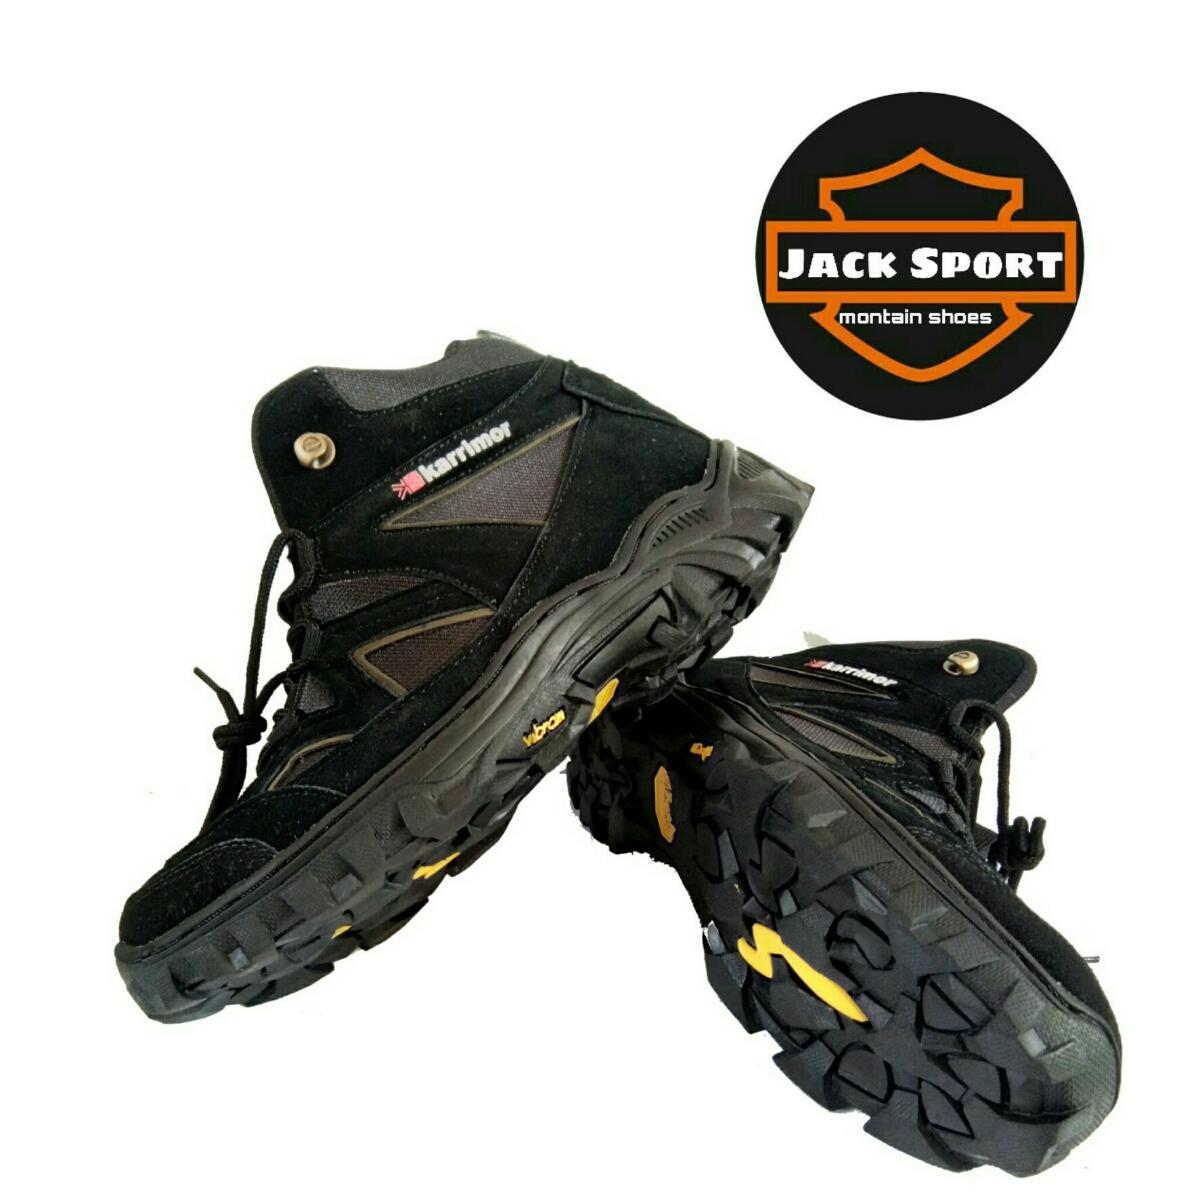 Sepatu Karrimor Daftar Harga Desember 2018 Gunung Snta 471 Series Trekking Hiking Outdoor Pria Low Tracking Boots Waterproof